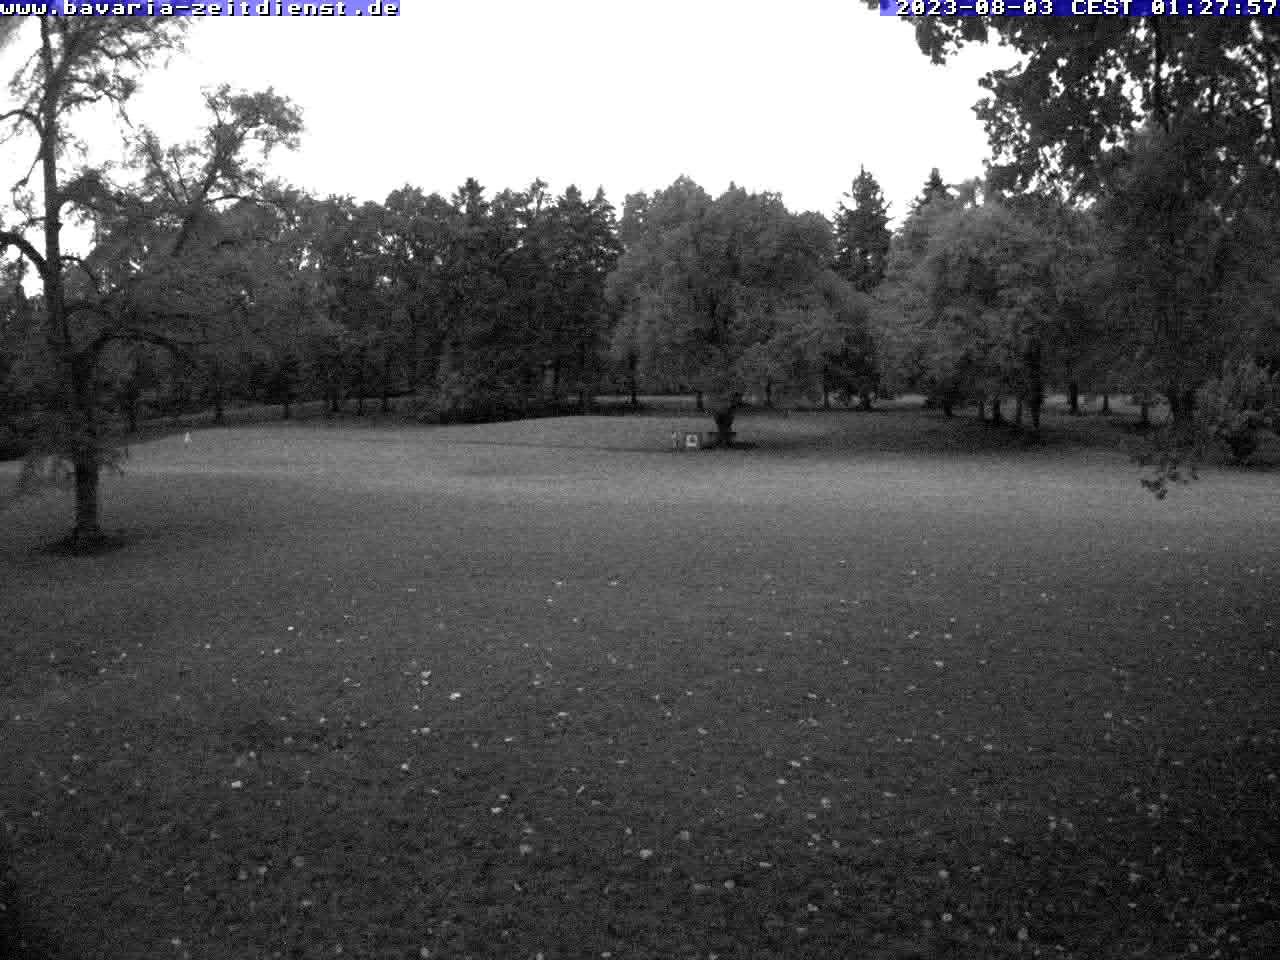 Webcam auf dem Golfplatz